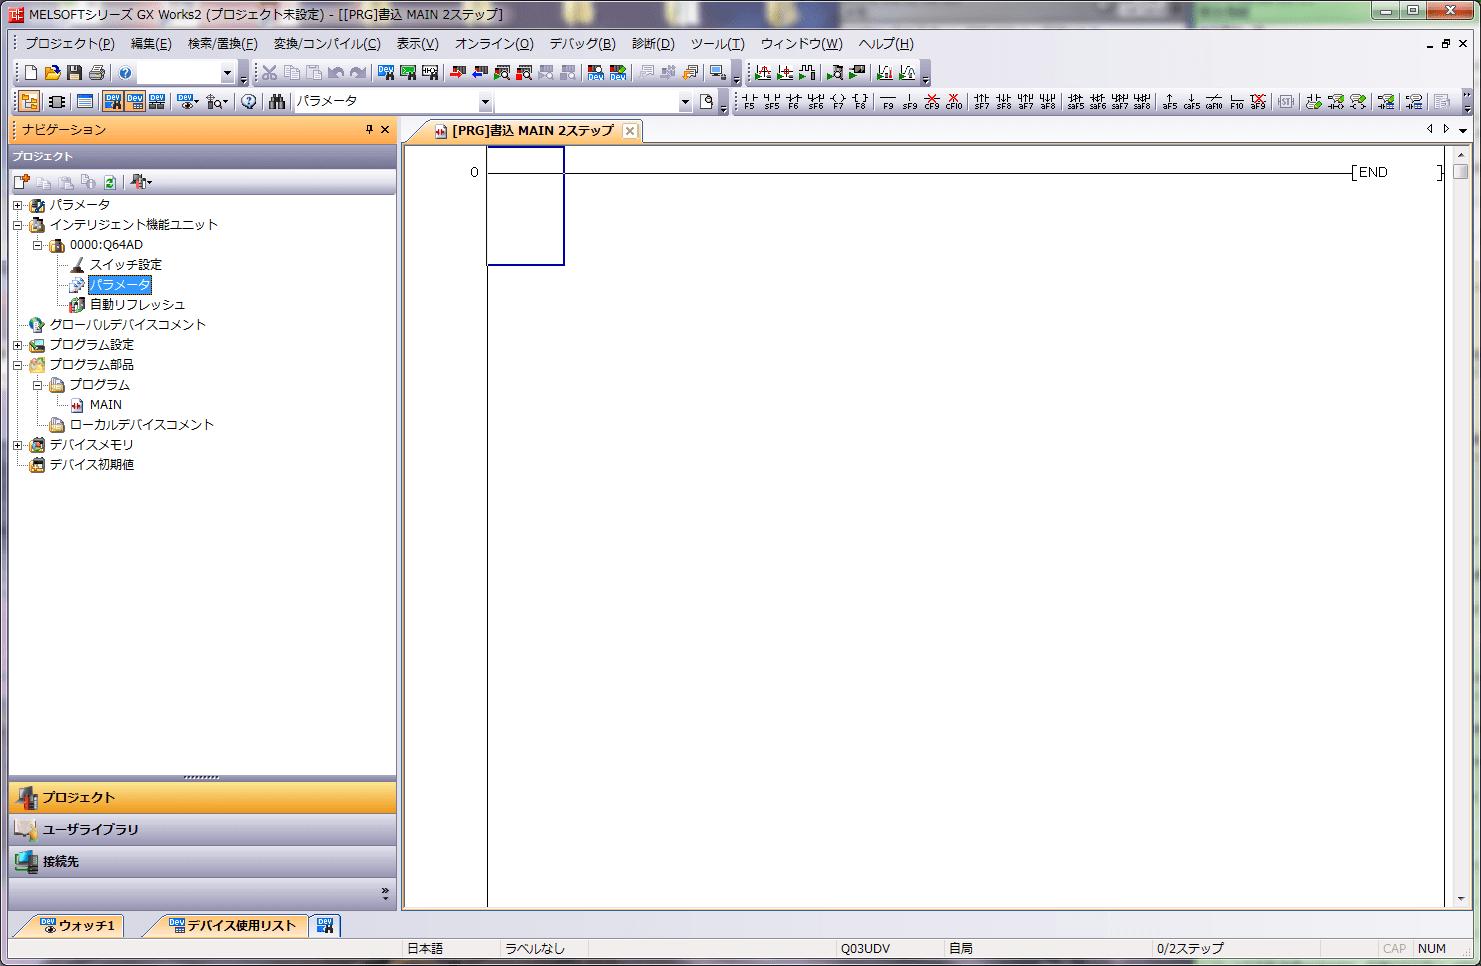 Q64ADパラメータ設定